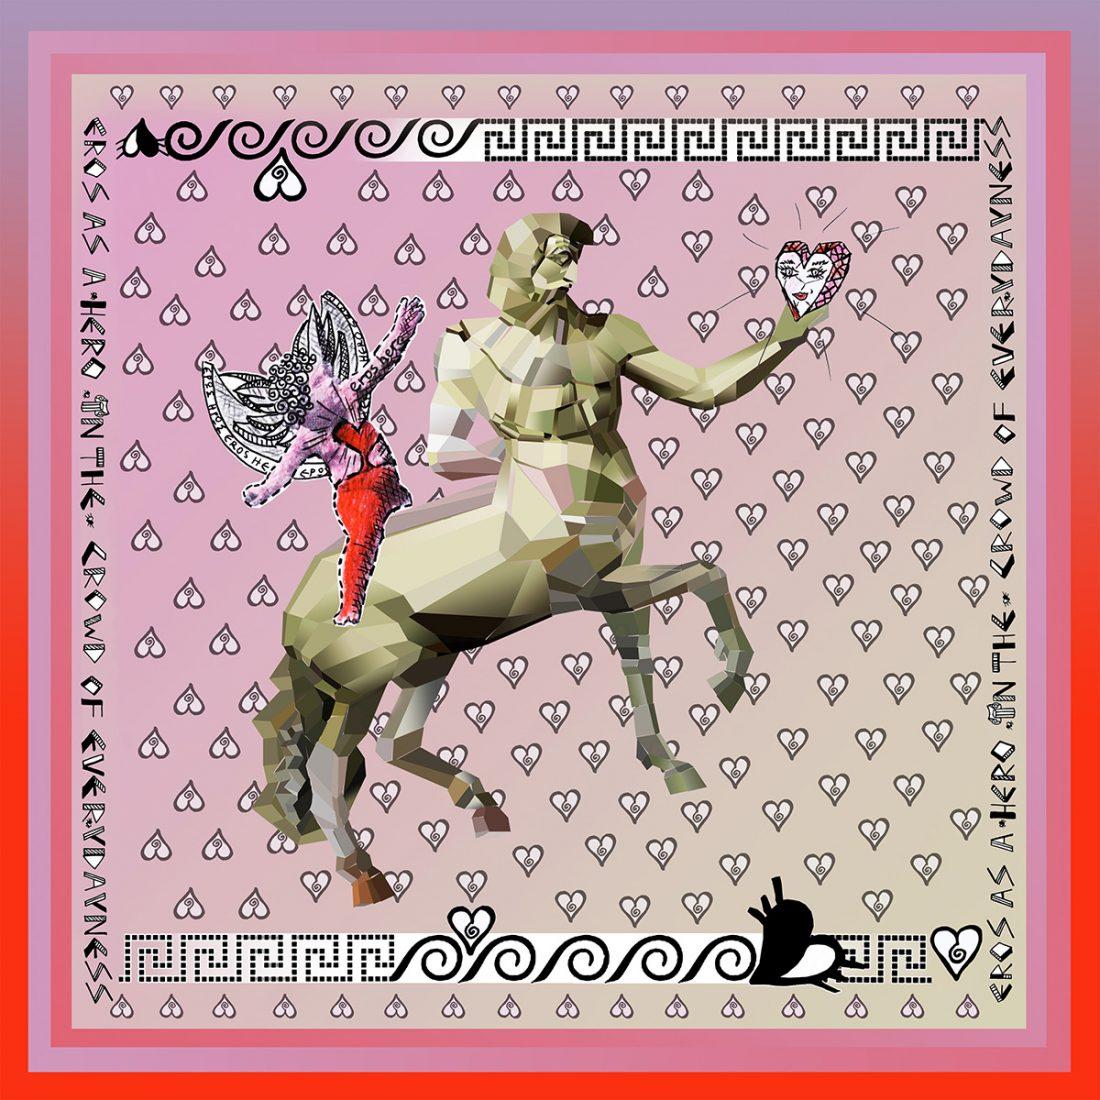 Eros Teasing Centaur